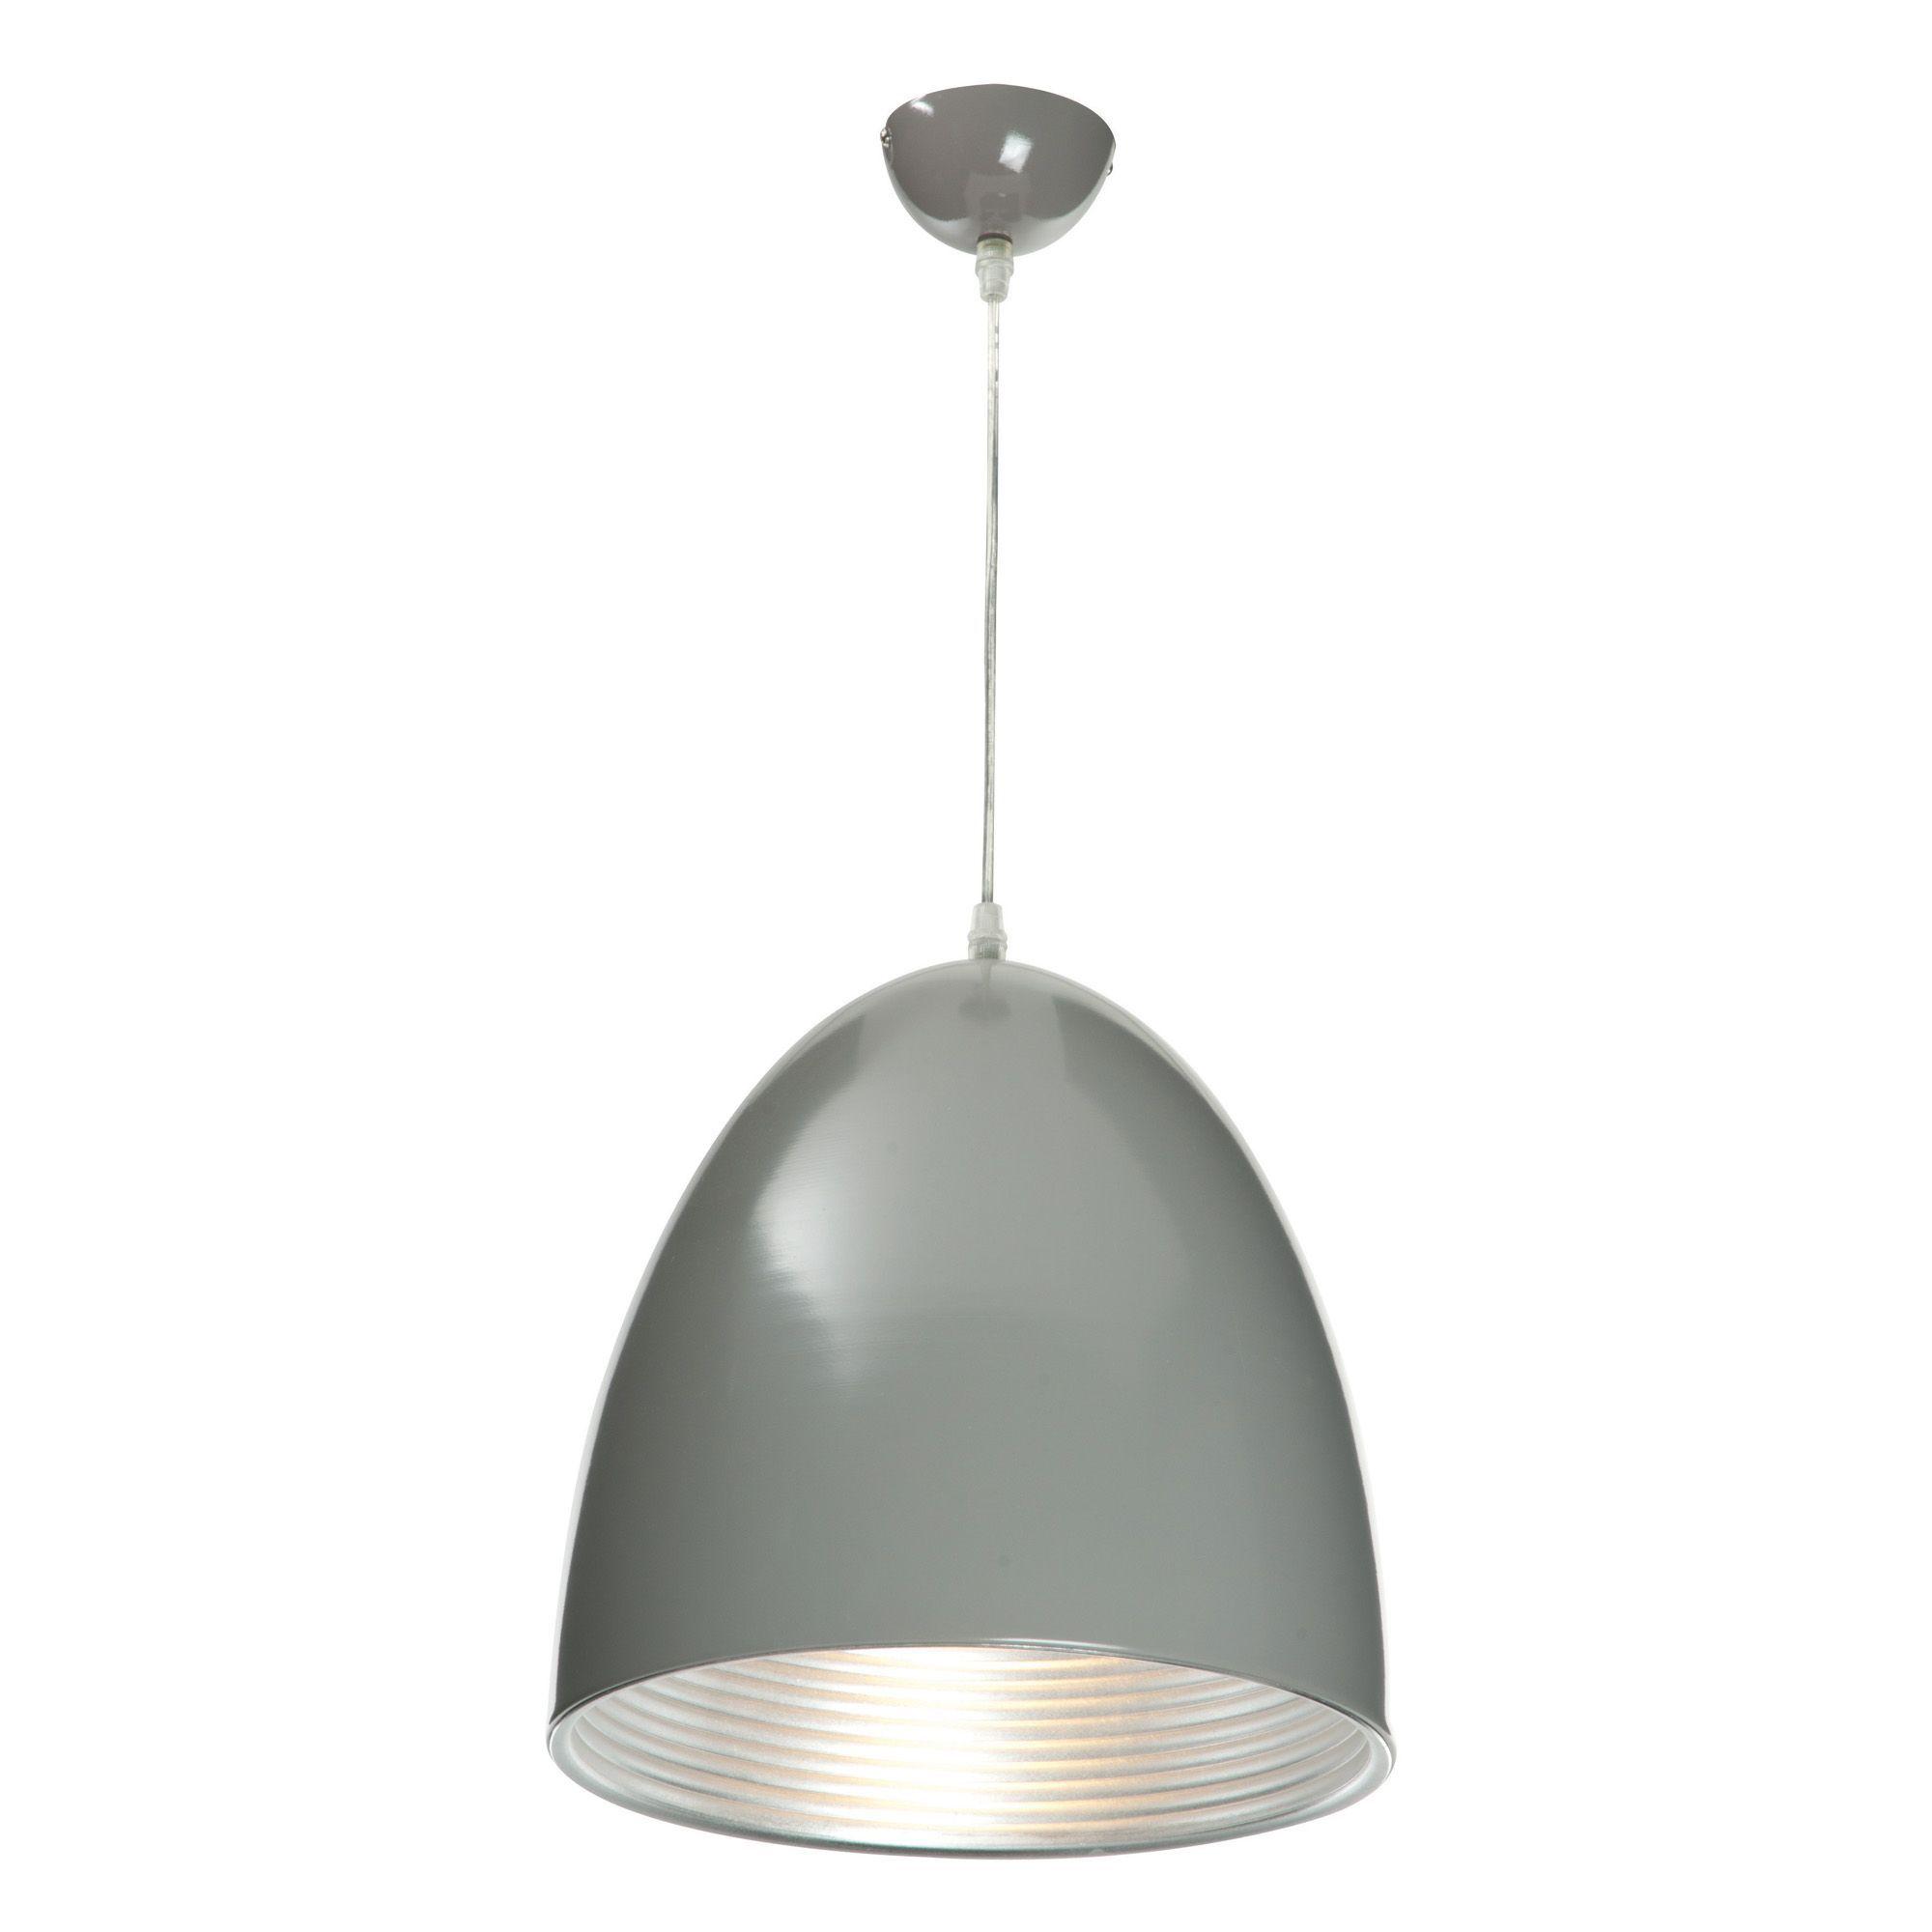 ripple grey pendant ceiling light departments diy at b q